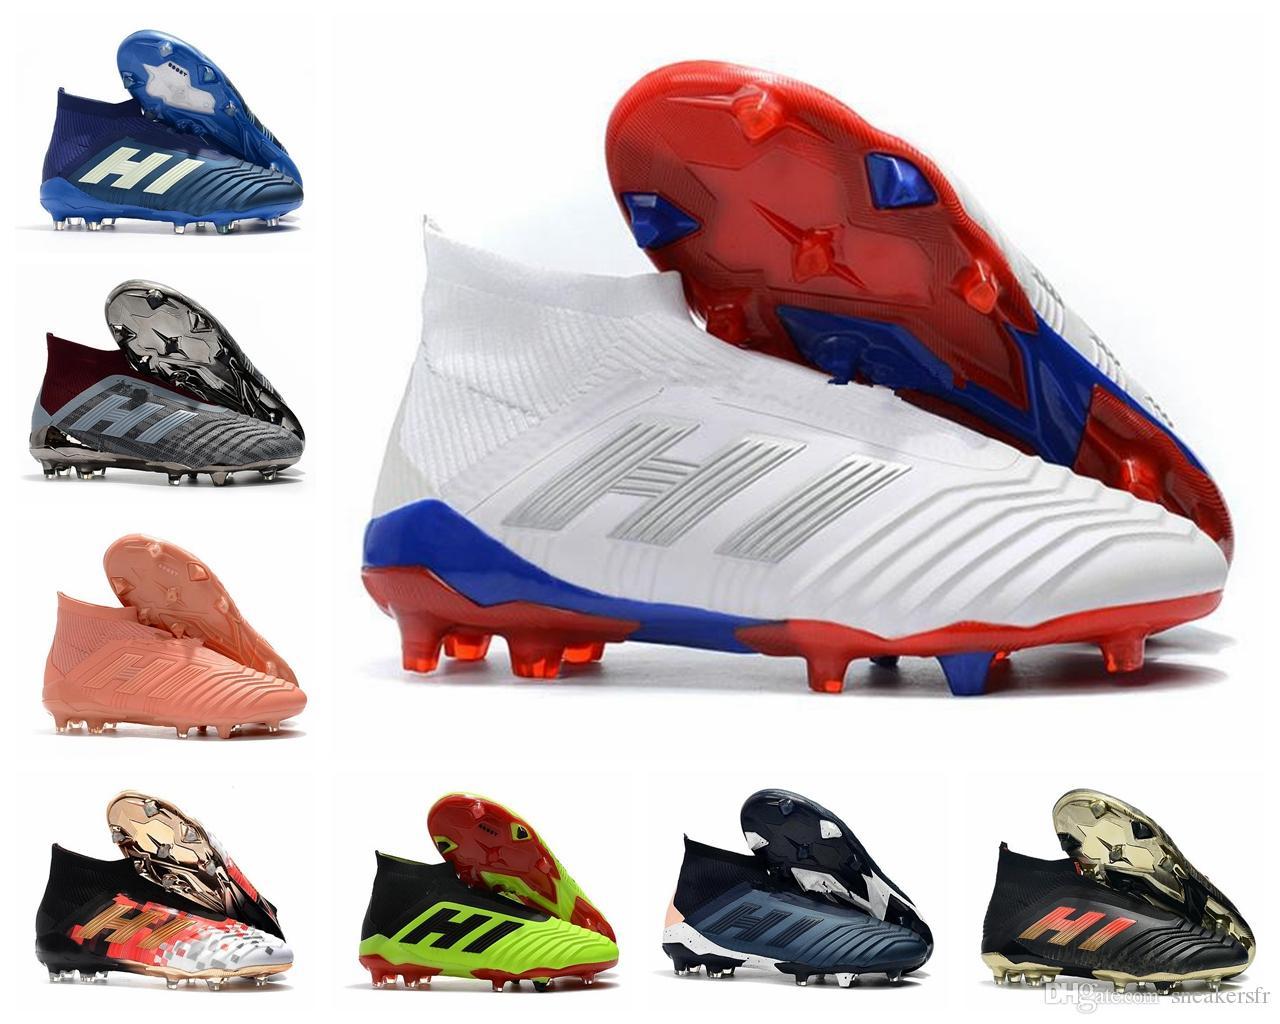 ADIDAS Predator 18 Predator 18.1 FG PP Paul Pogba Fußball 18 x Stollen Slip On Fußballschuhe Herren High Top Fußballschuhe günstig